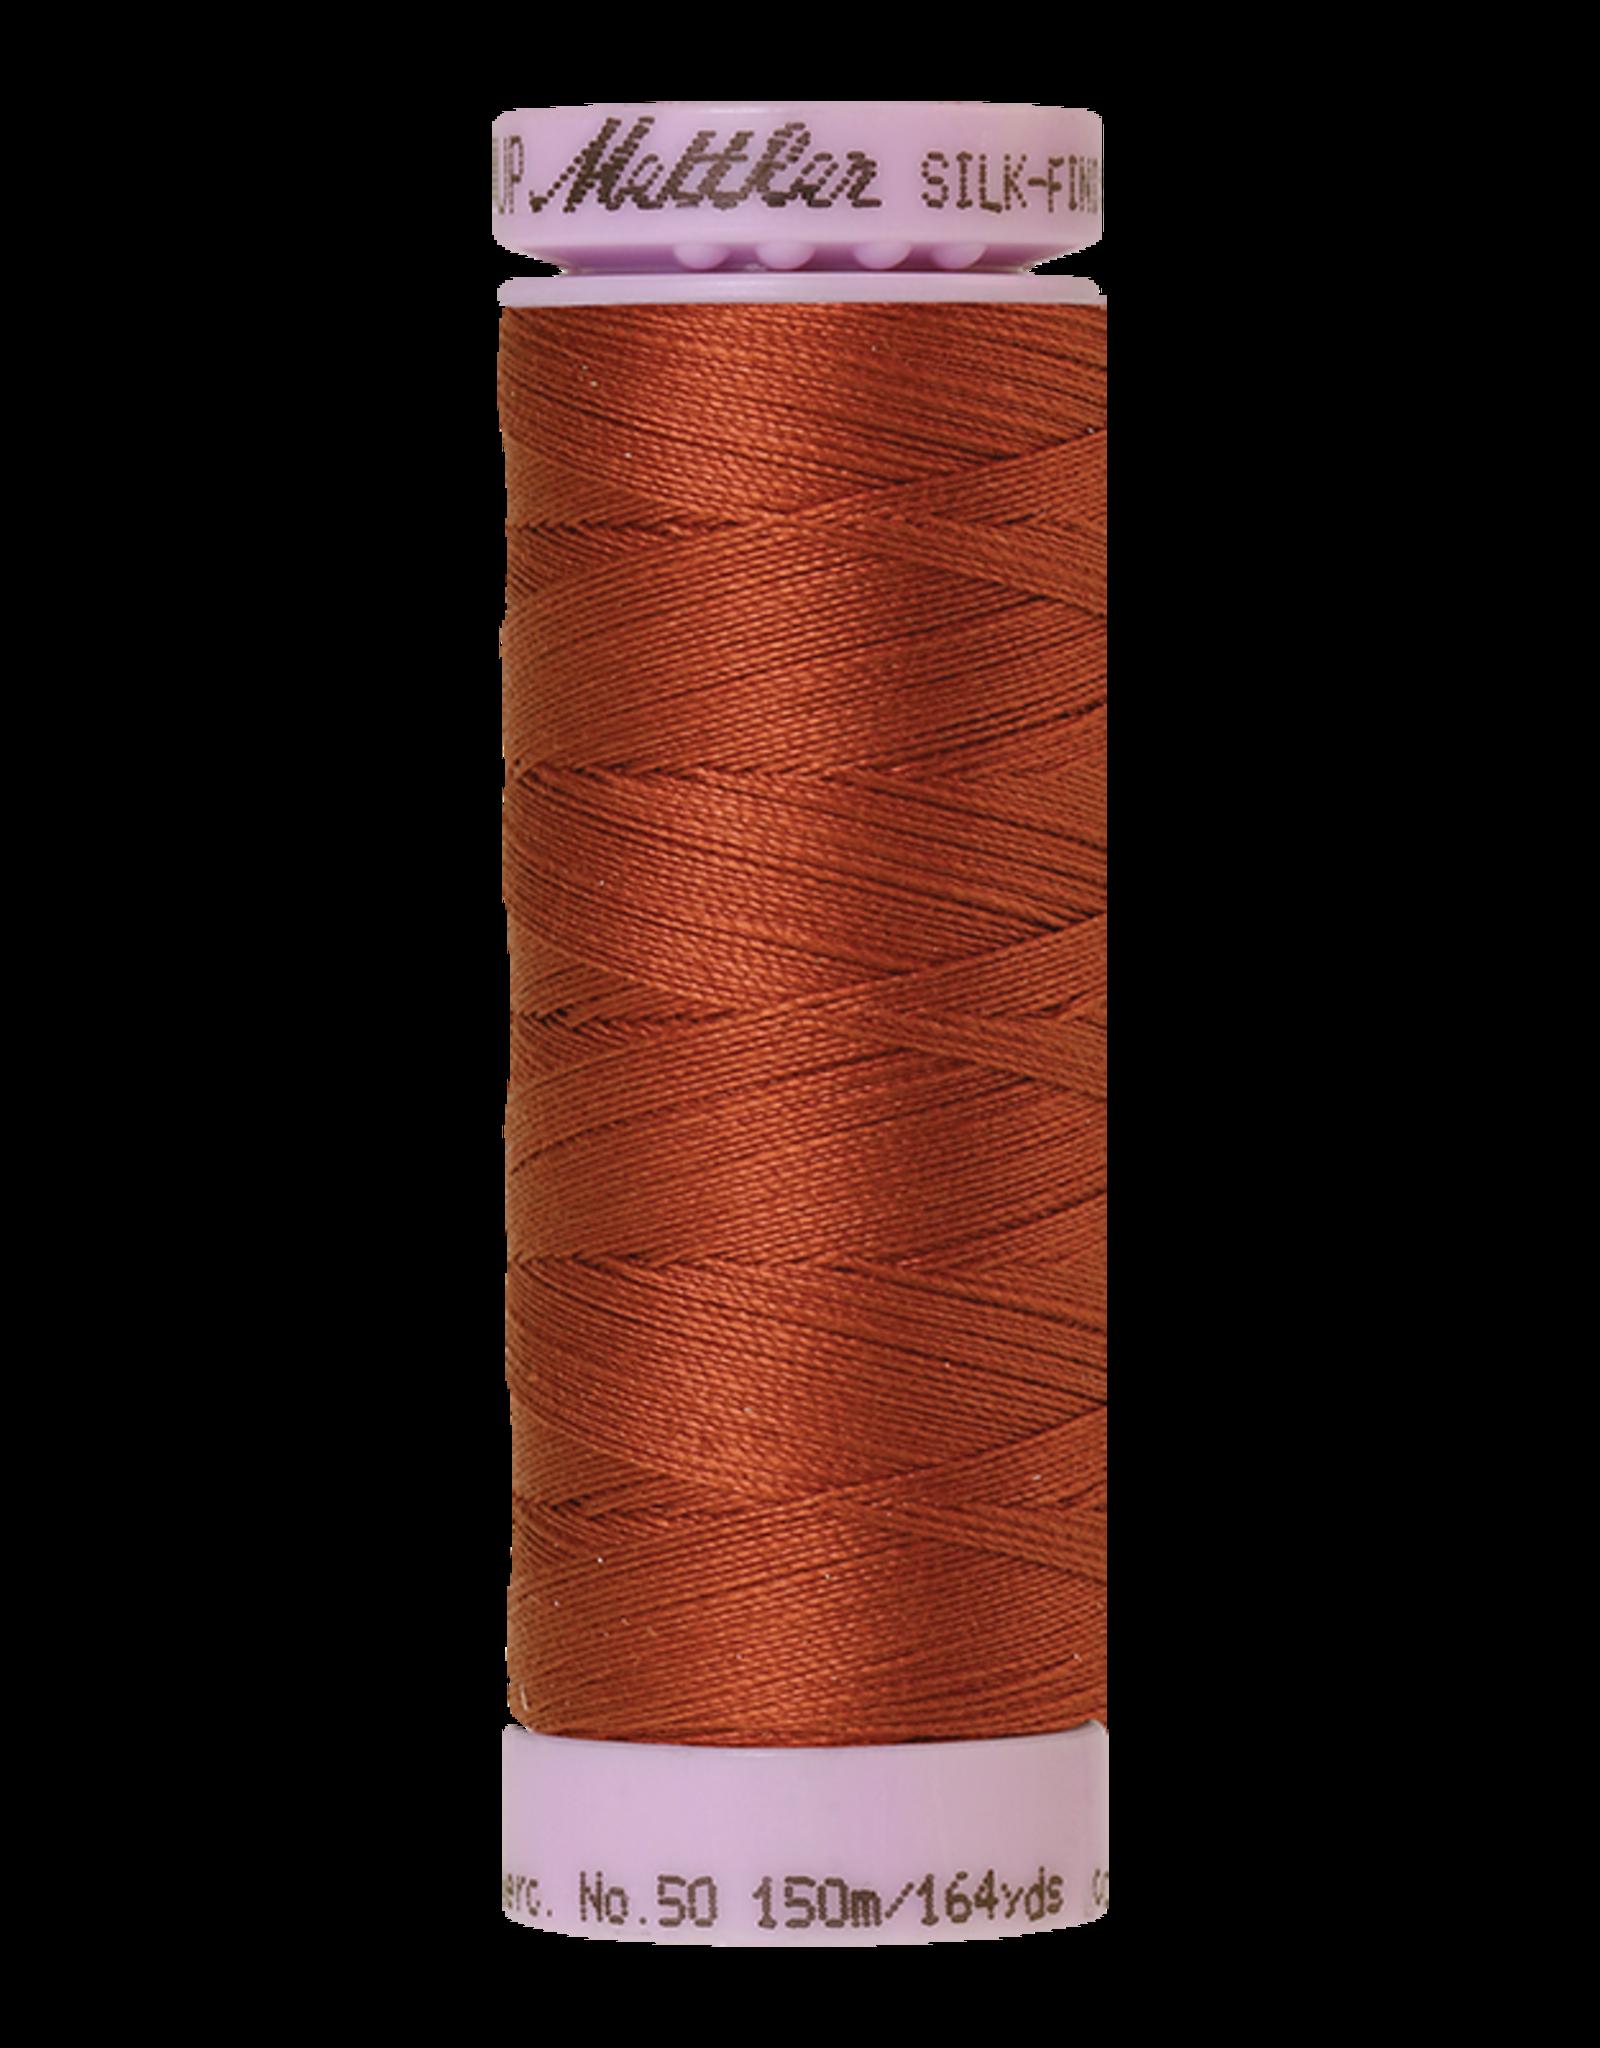 Mettler Silk Finish Cotton 50 - 150 meter - 1347